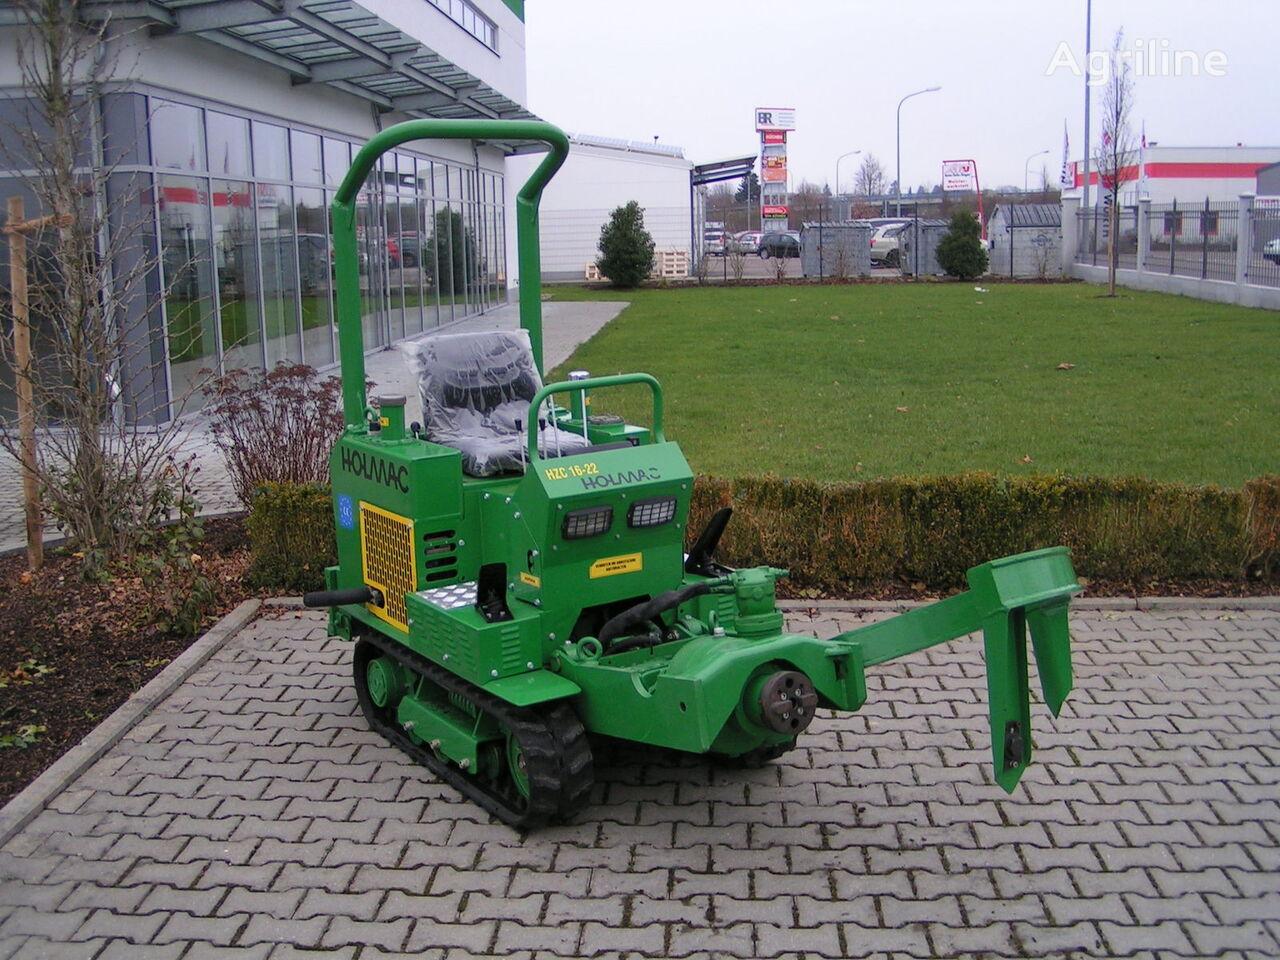 Holmac szc 16-22 other farm equipment